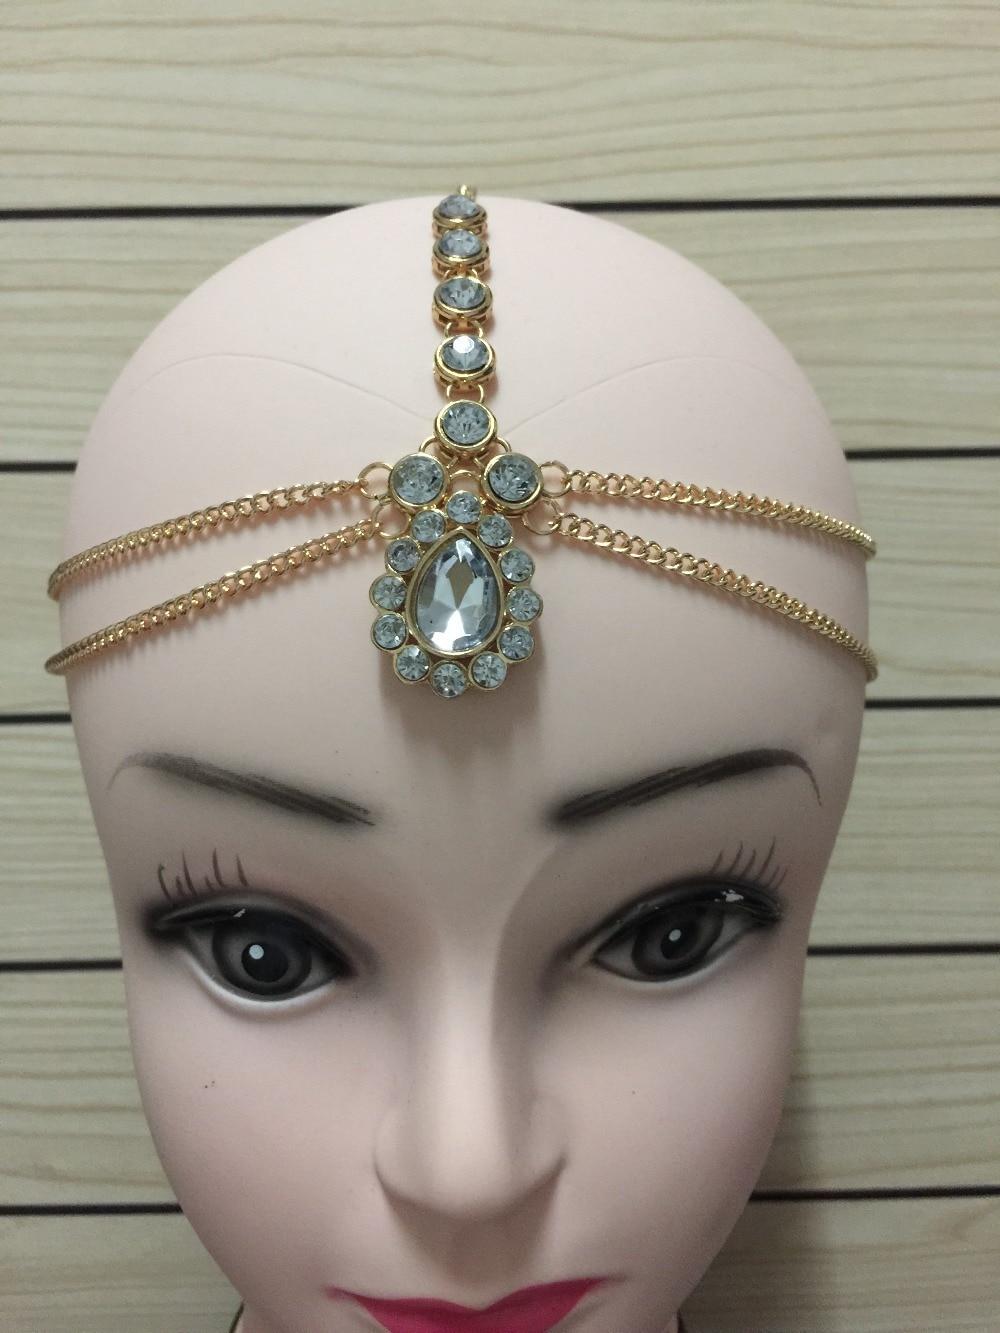 Hermosa pieza de cabeza india de piedra Kundan hecha a mano de estilo de cabello matha patti